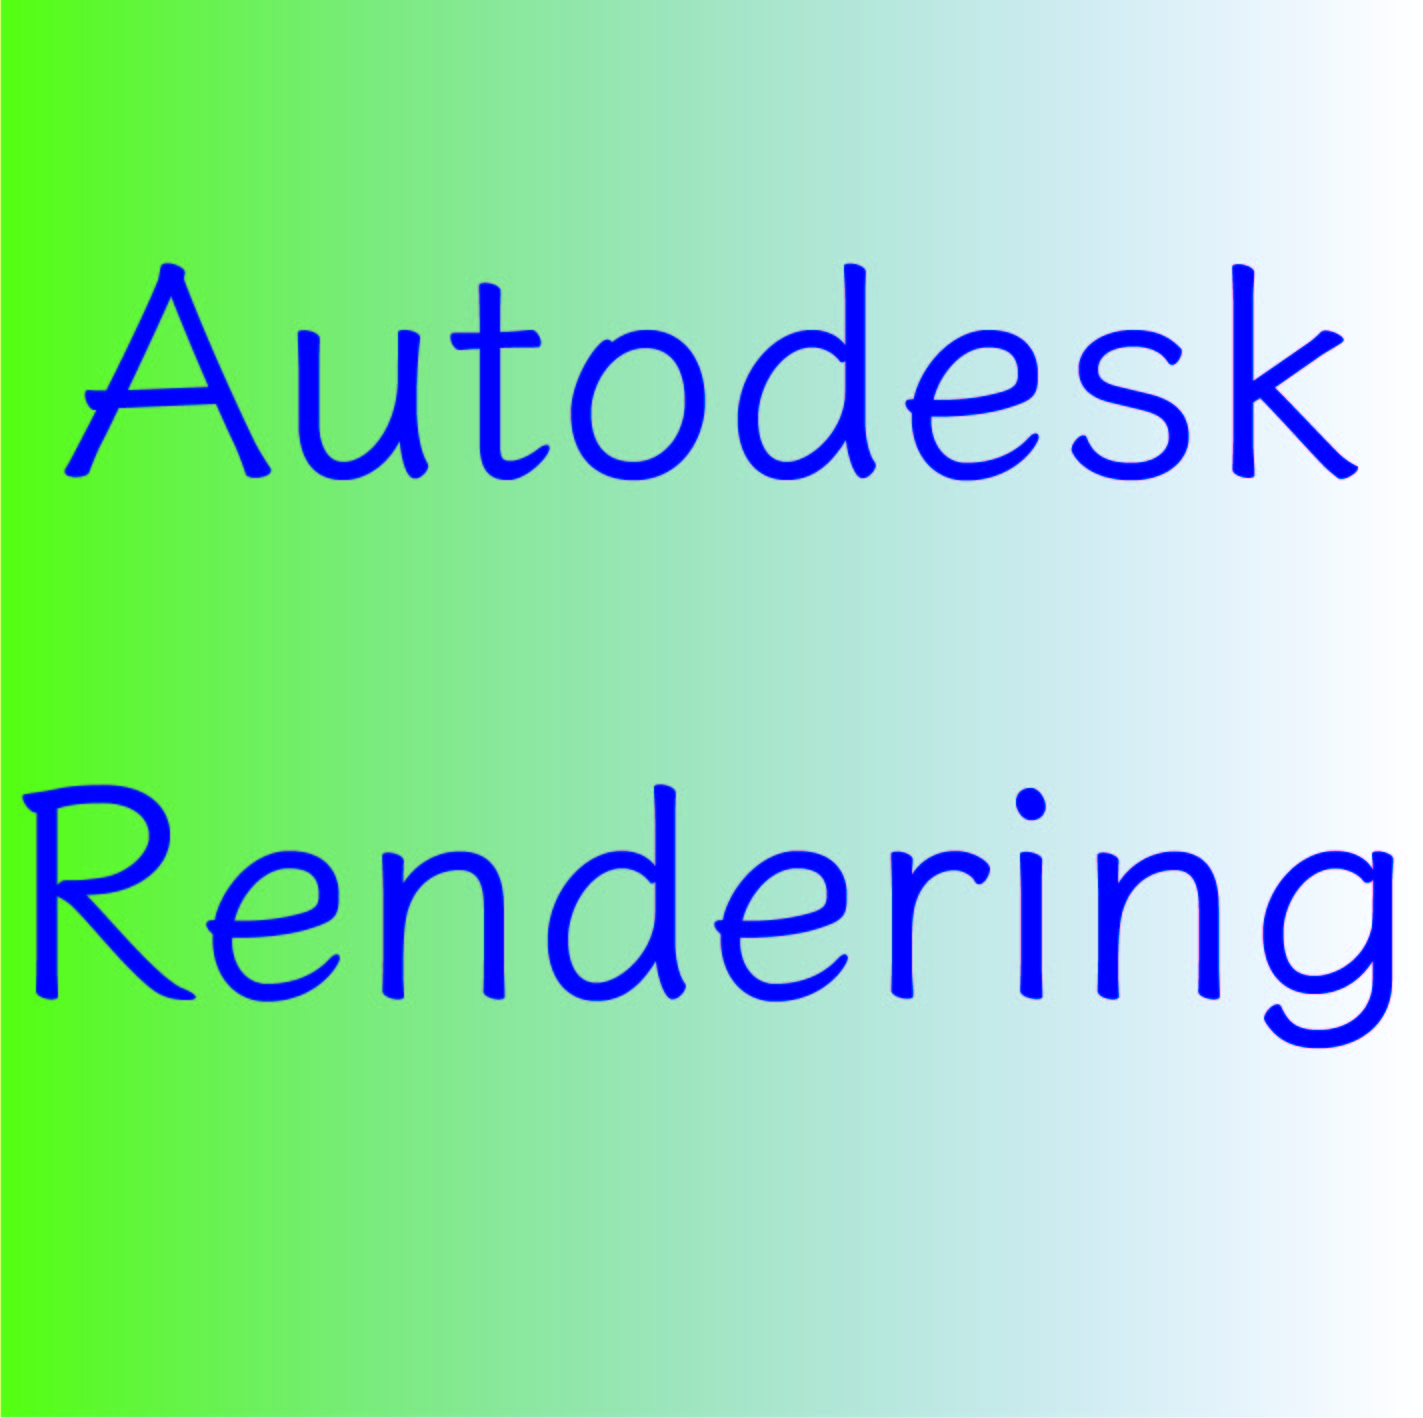 Autodesk Renderingとは